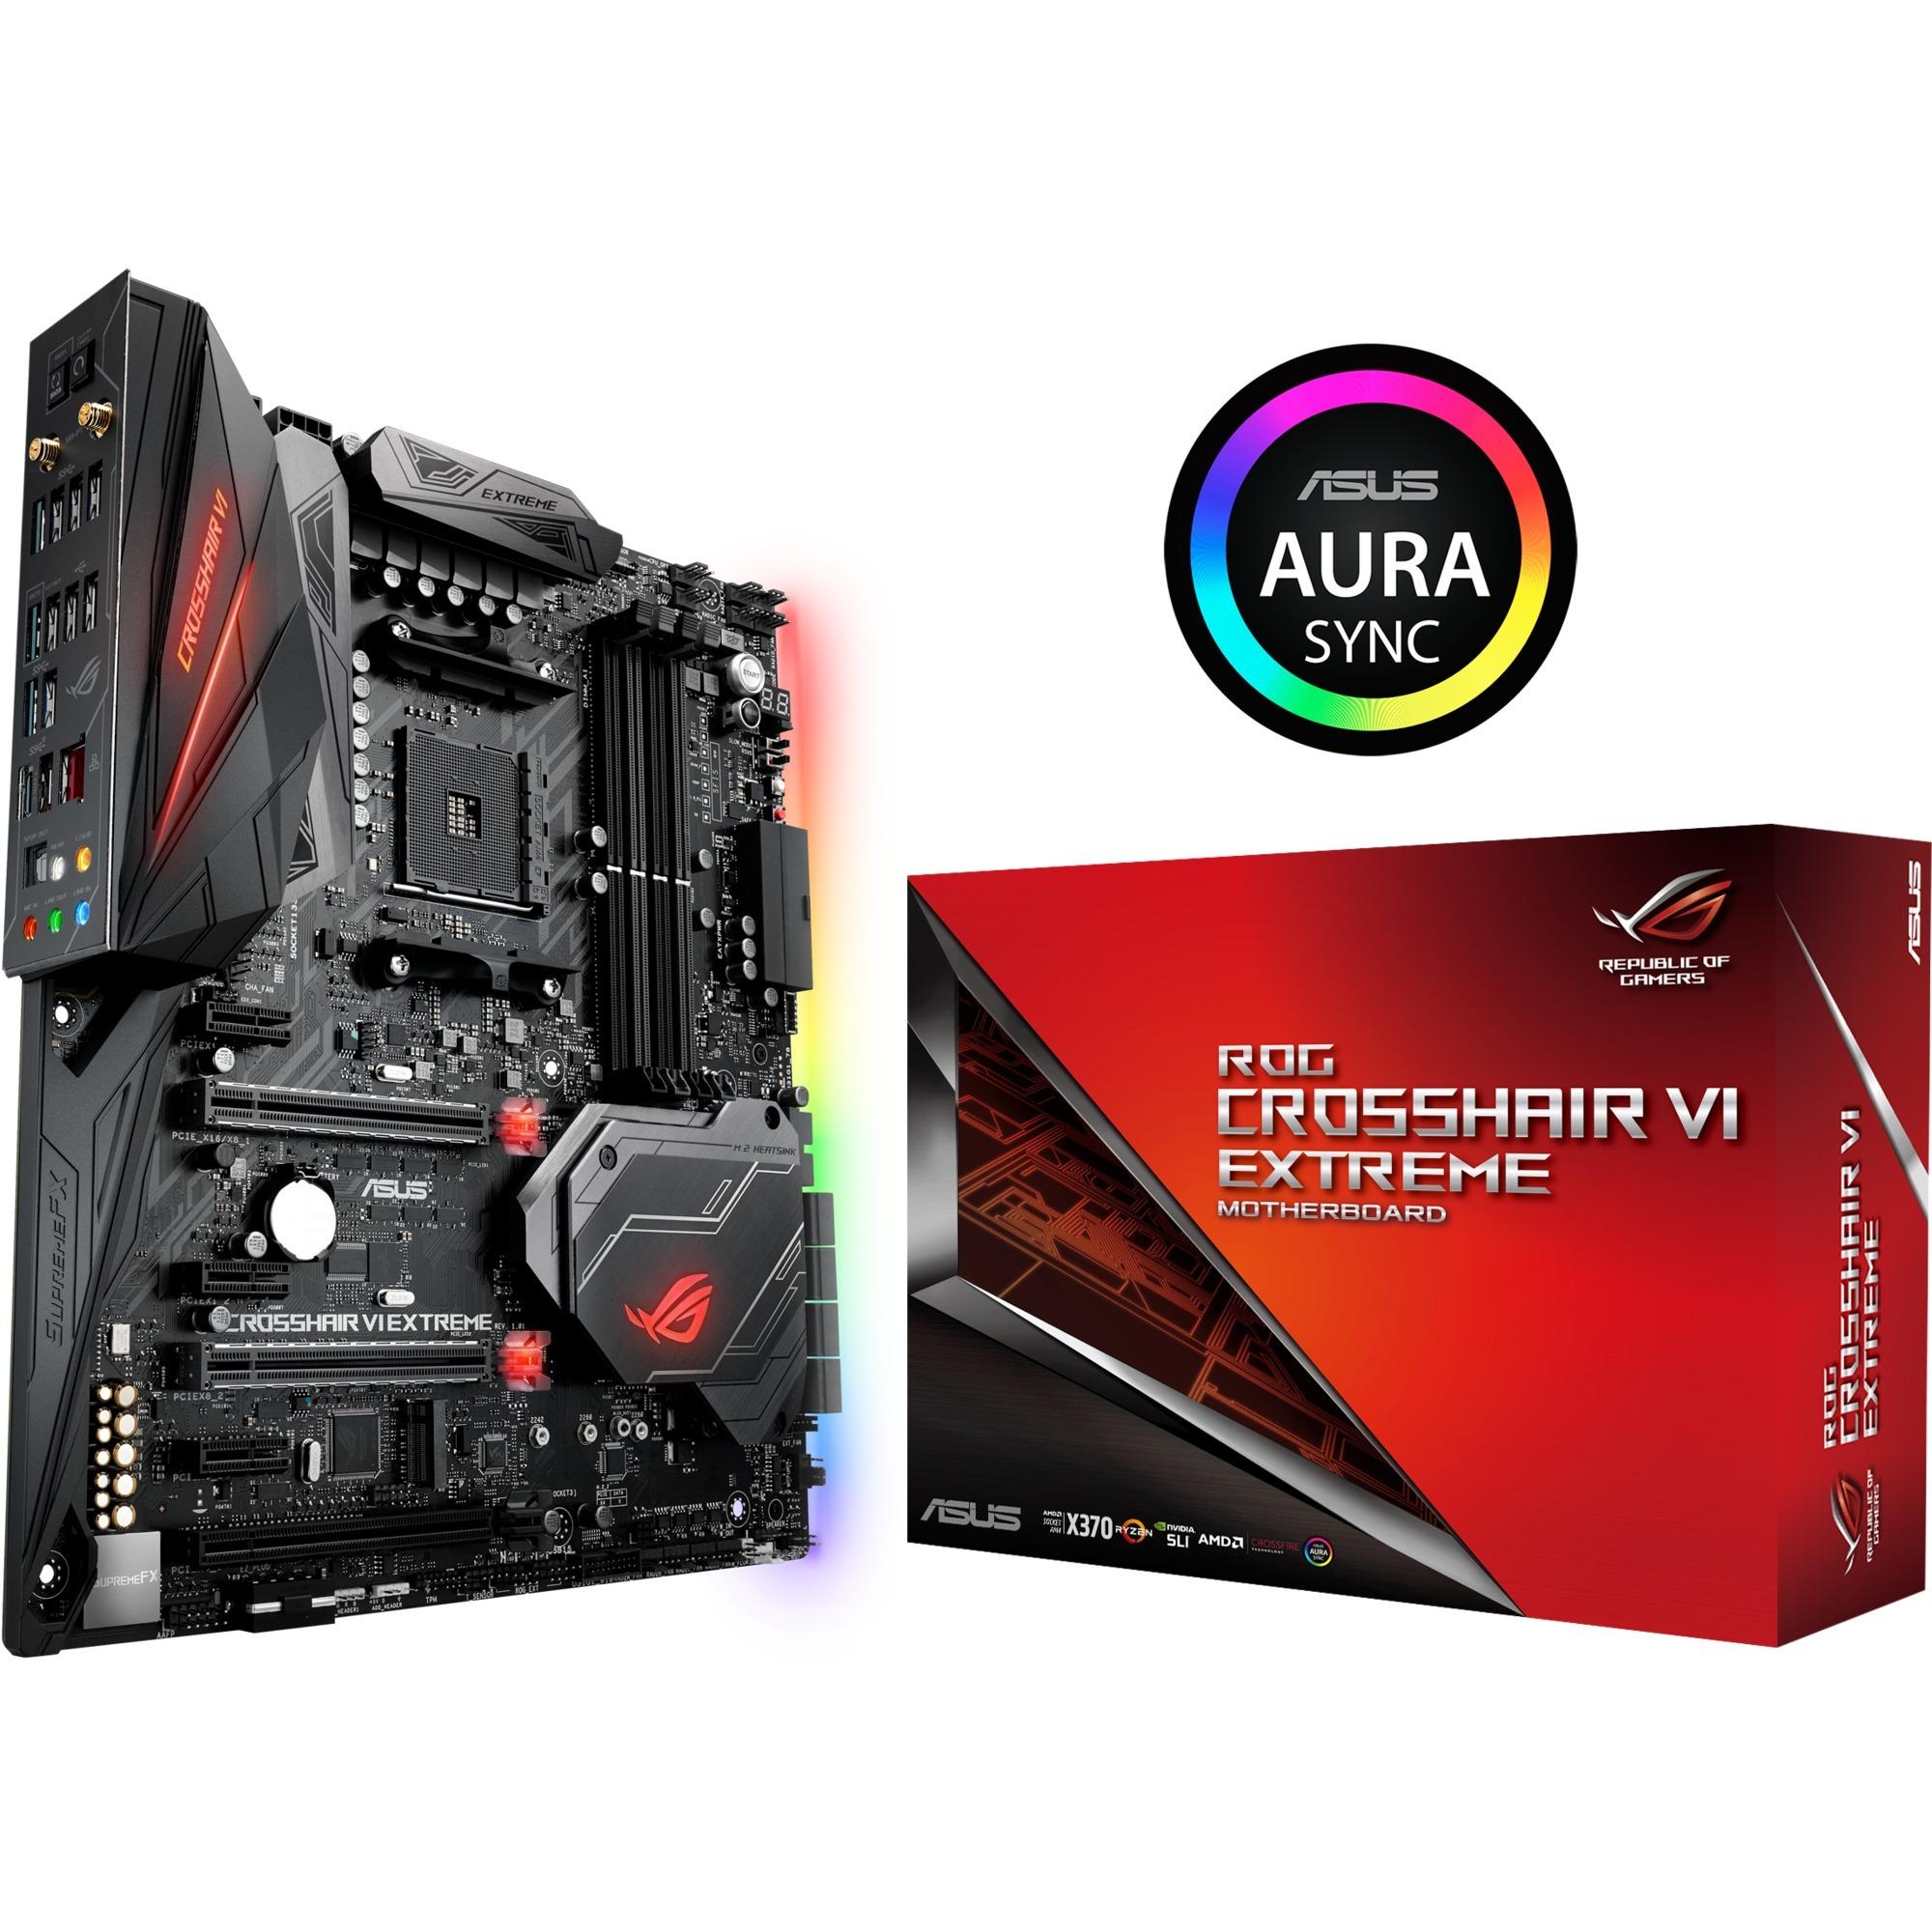 ROG CROSSHAIR VI EXTREME AMD X370 Socket AM4 ATX étendu carte mère